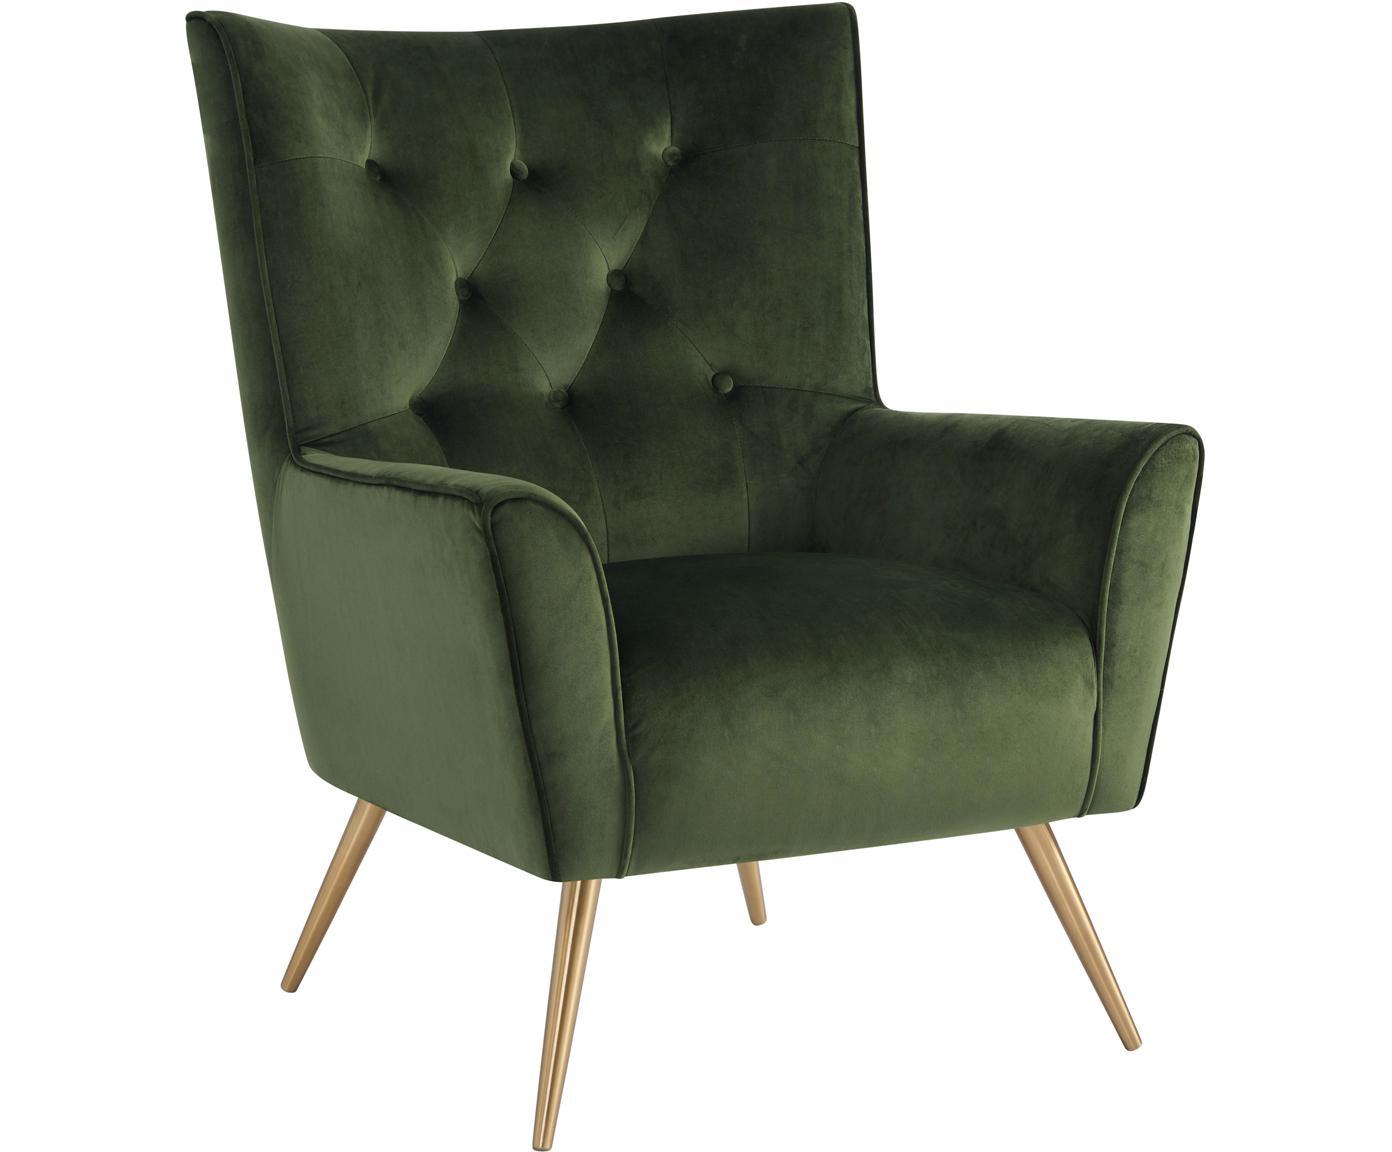 Samt-Ohrensessel Bodiva, Bezug: Polyester (Samt), Waldgrün, Messingfarben, B 82 x T 88 cm